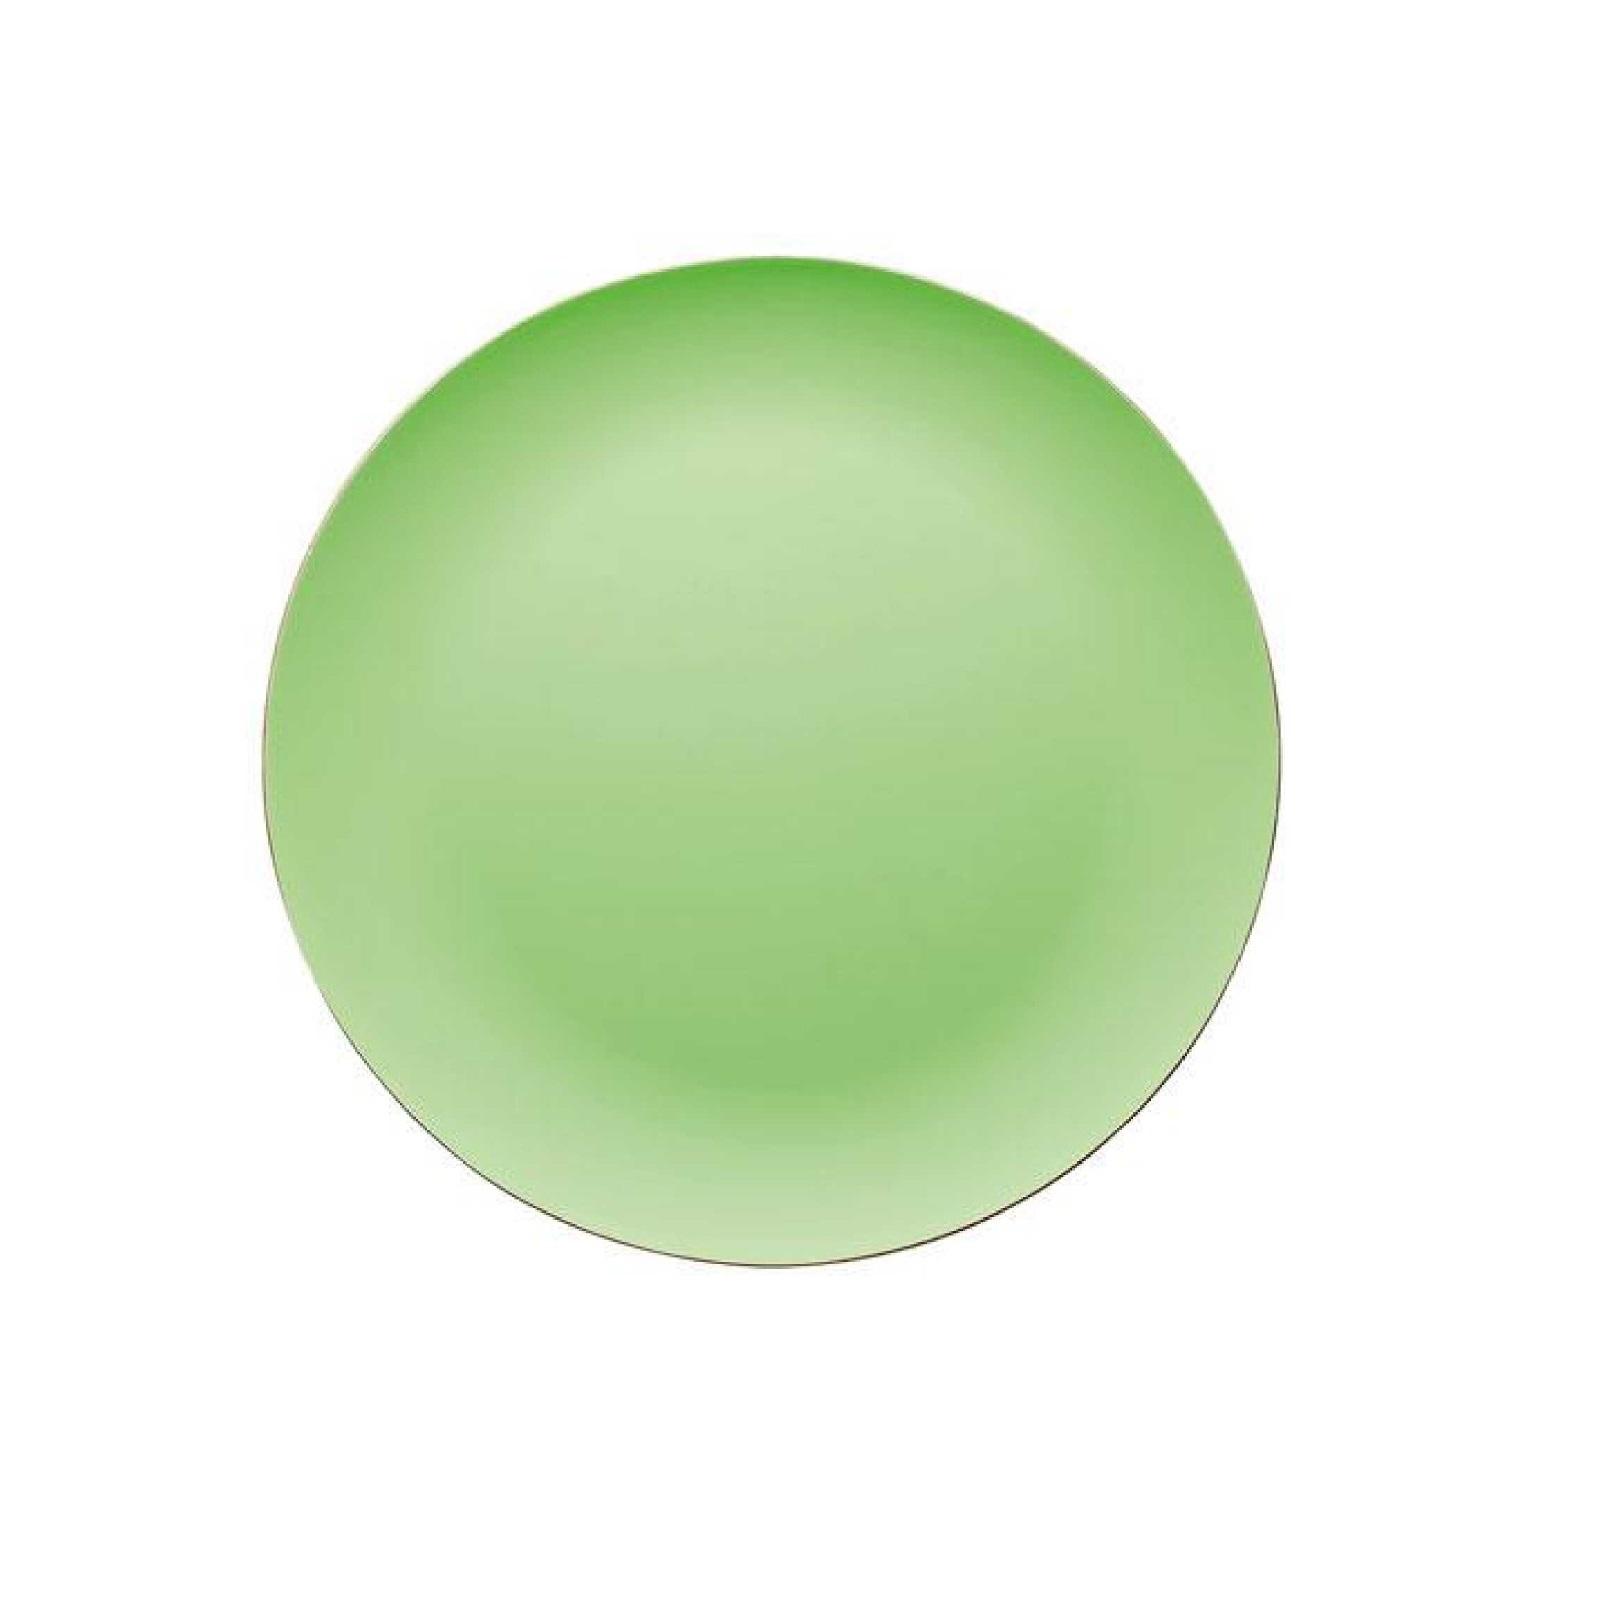 Поднос деревянный Rosenthal SUNNY DAY, диаметр 41 см, зеленый Rosenthal 69763-408527-05642 фото 2